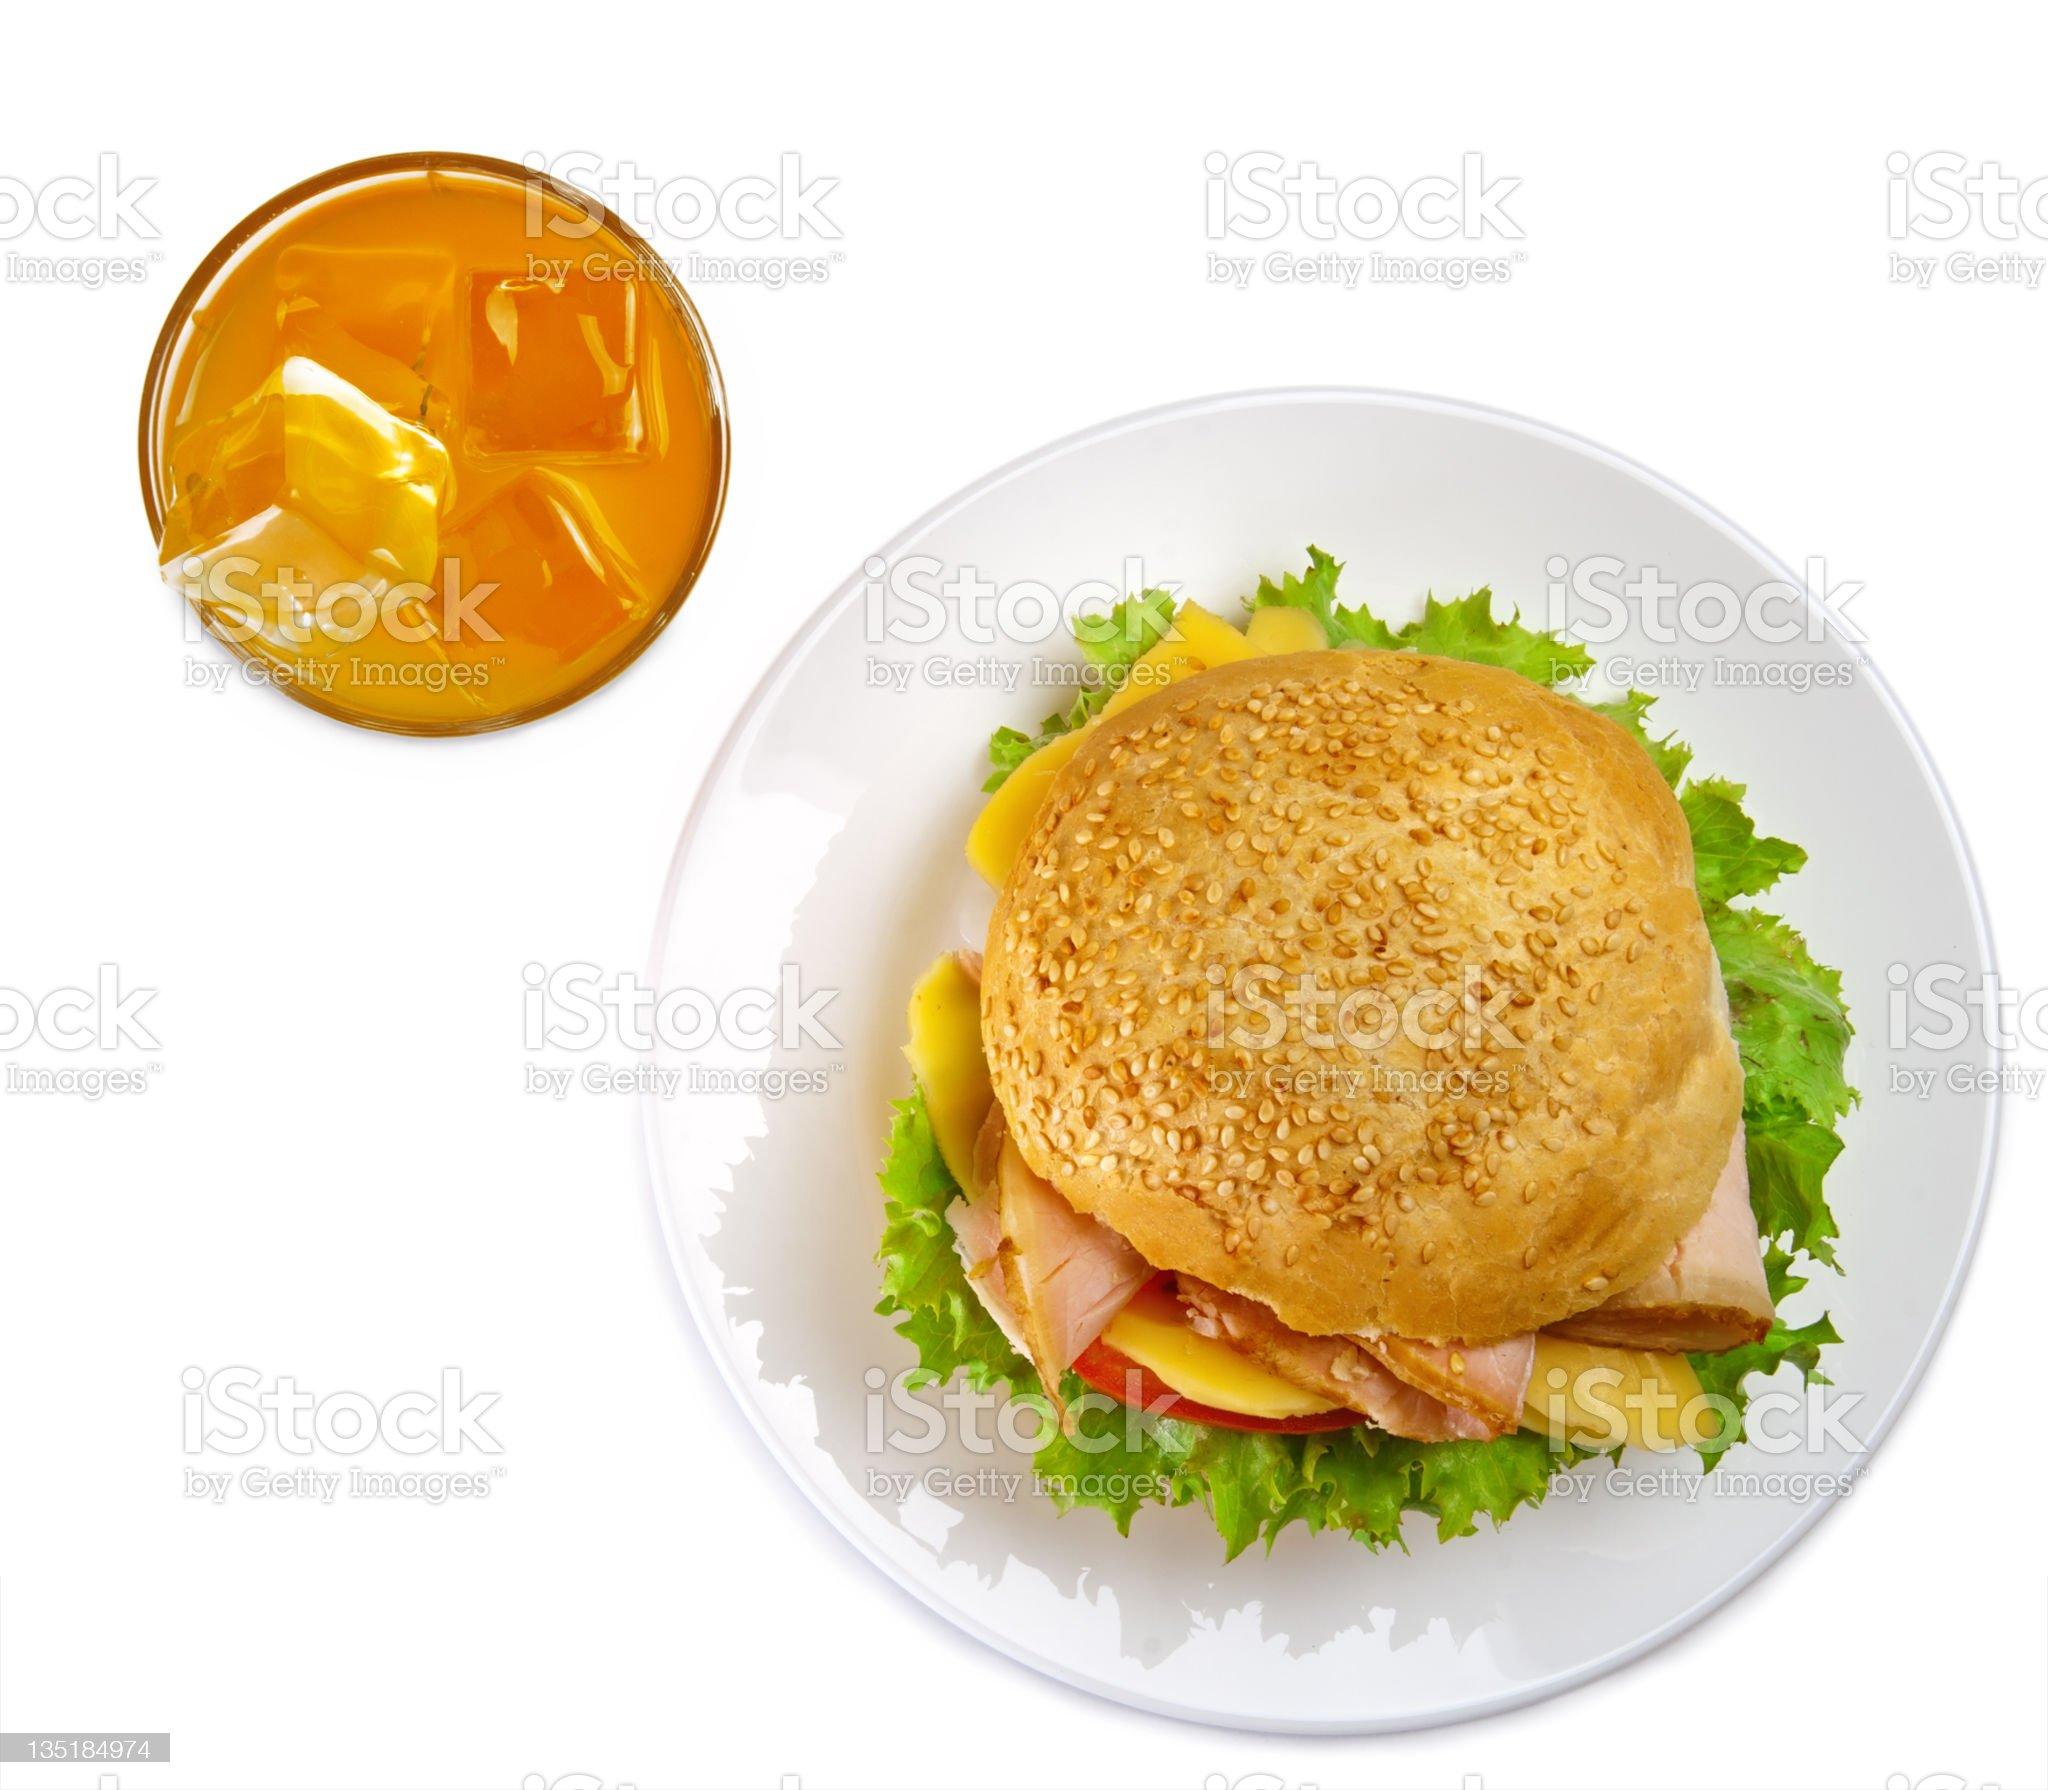 Appetizing sandwich and glass of orange juice royalty-free stock photo